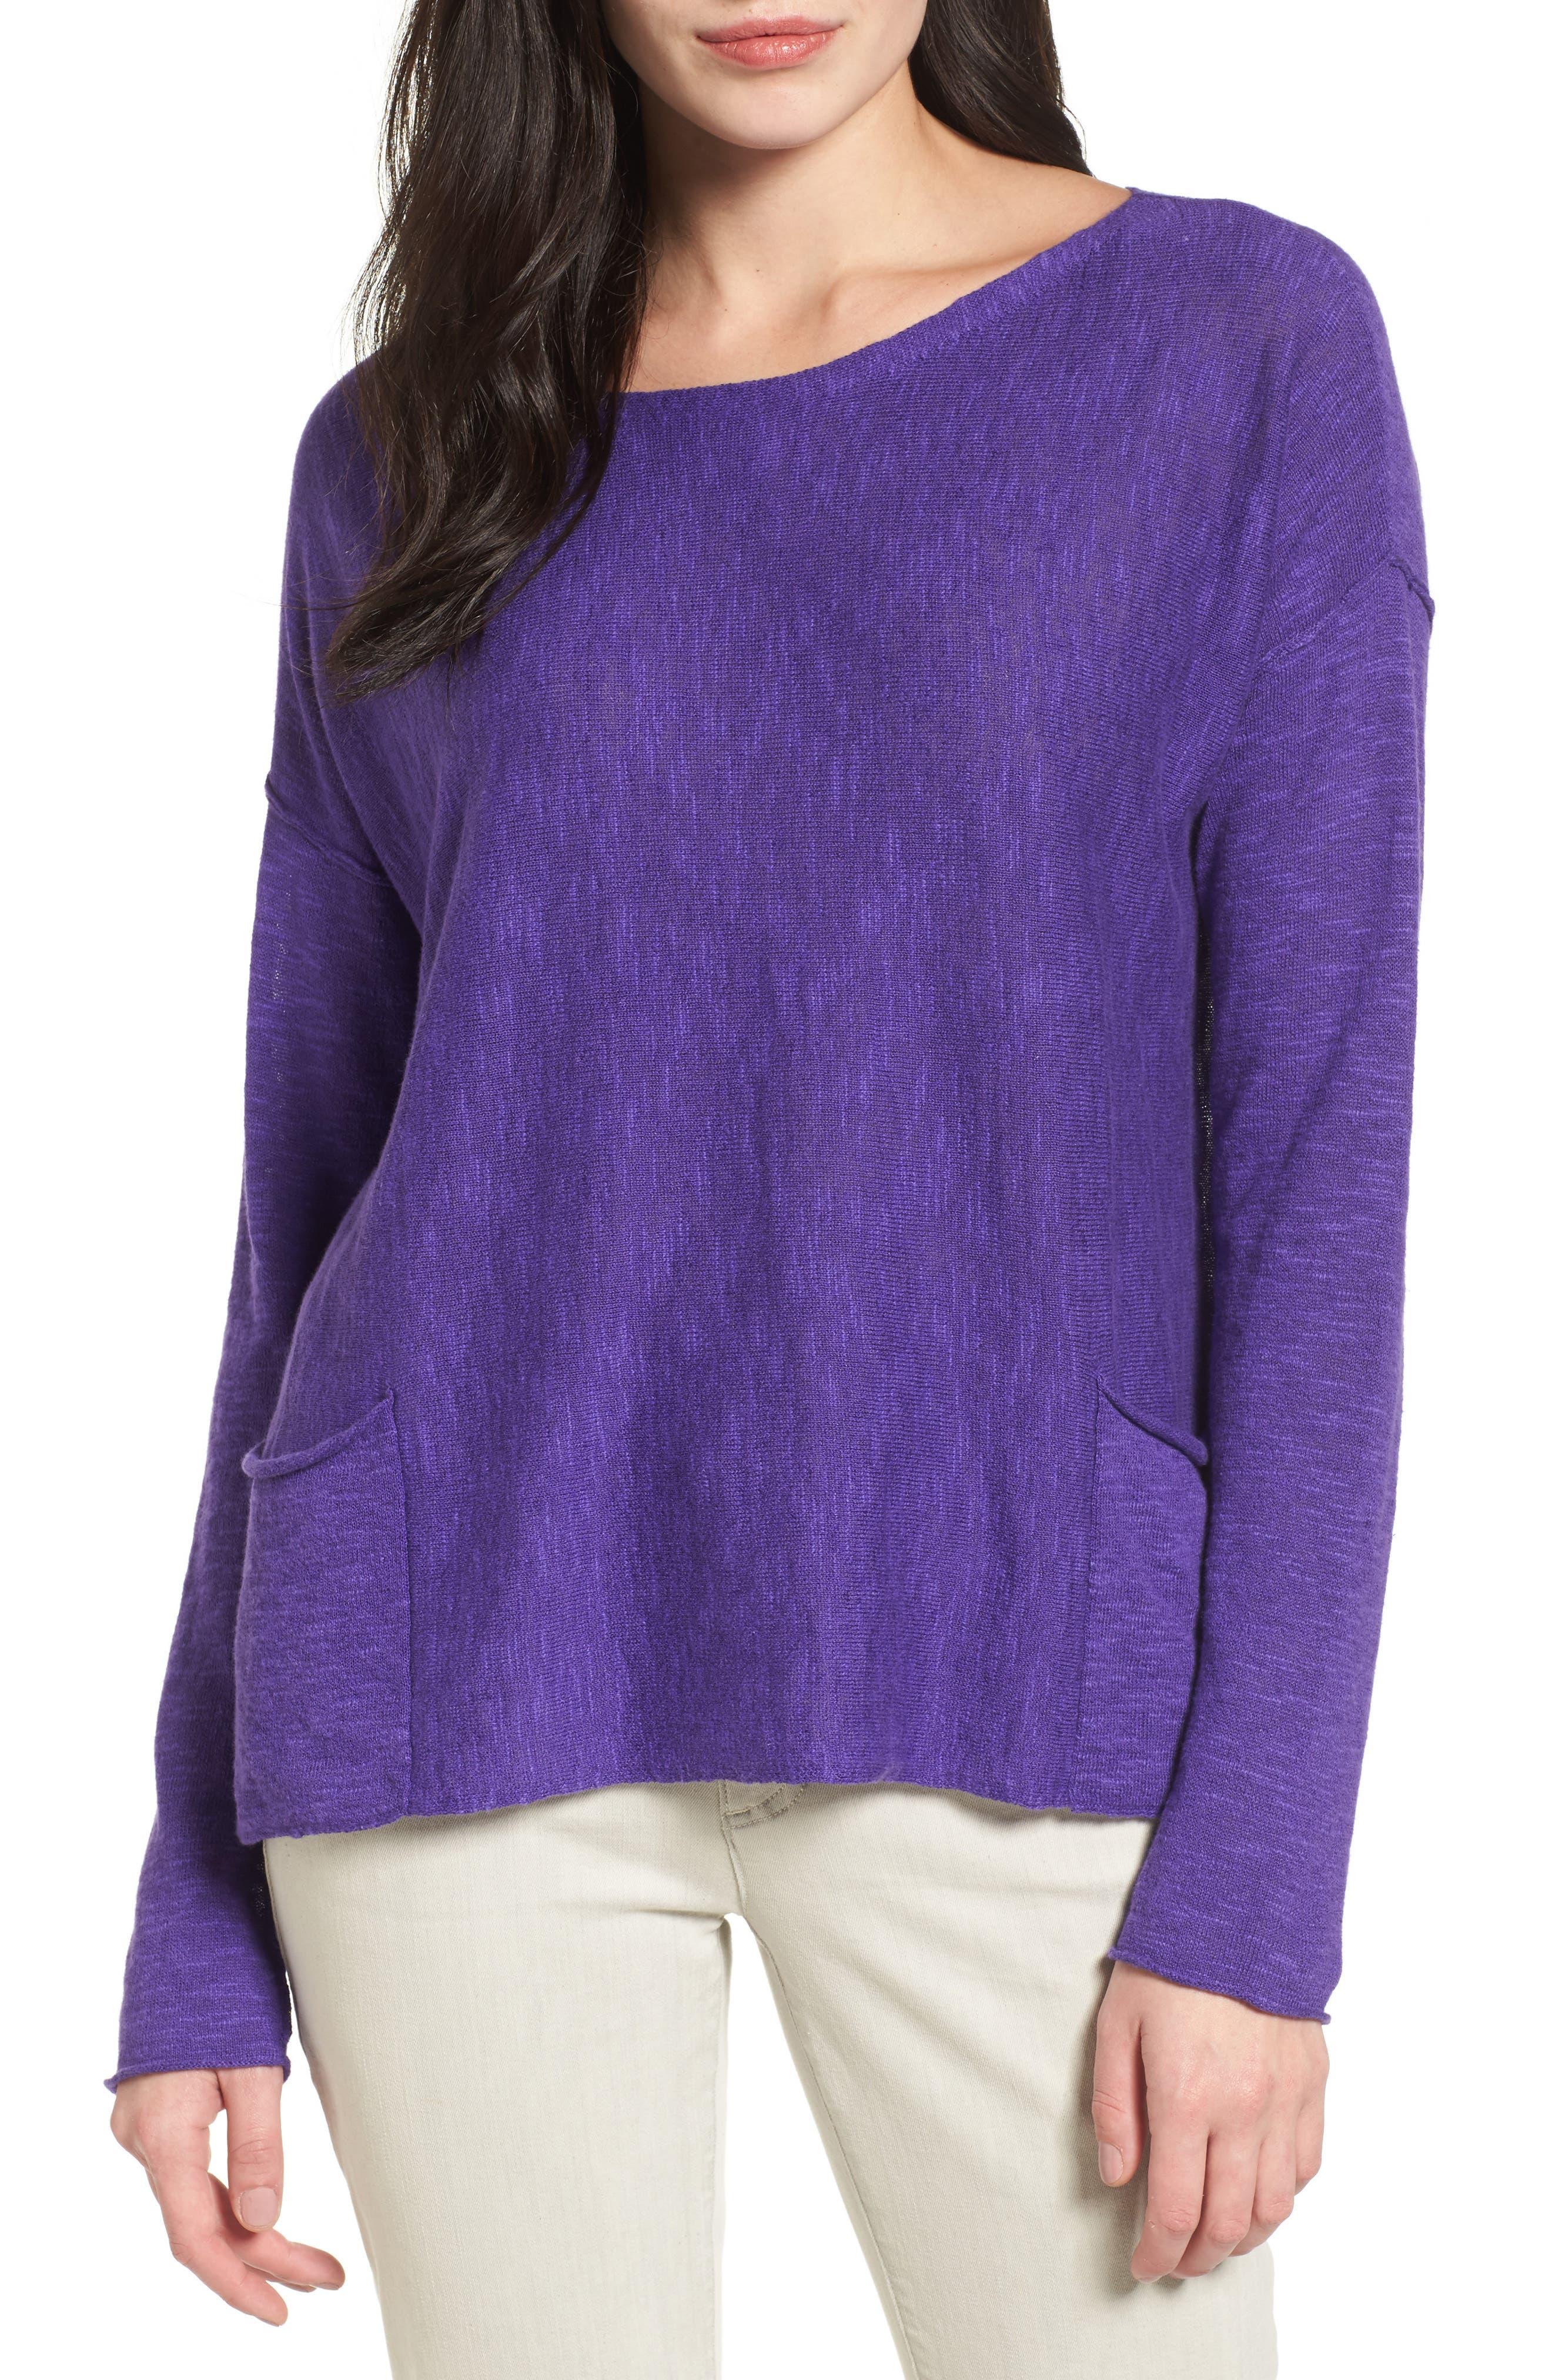 Alternate Image 1 Selected - Eileen Fisher Organic Linen & Cotton Knit Boxy Top (Regular & Petite)